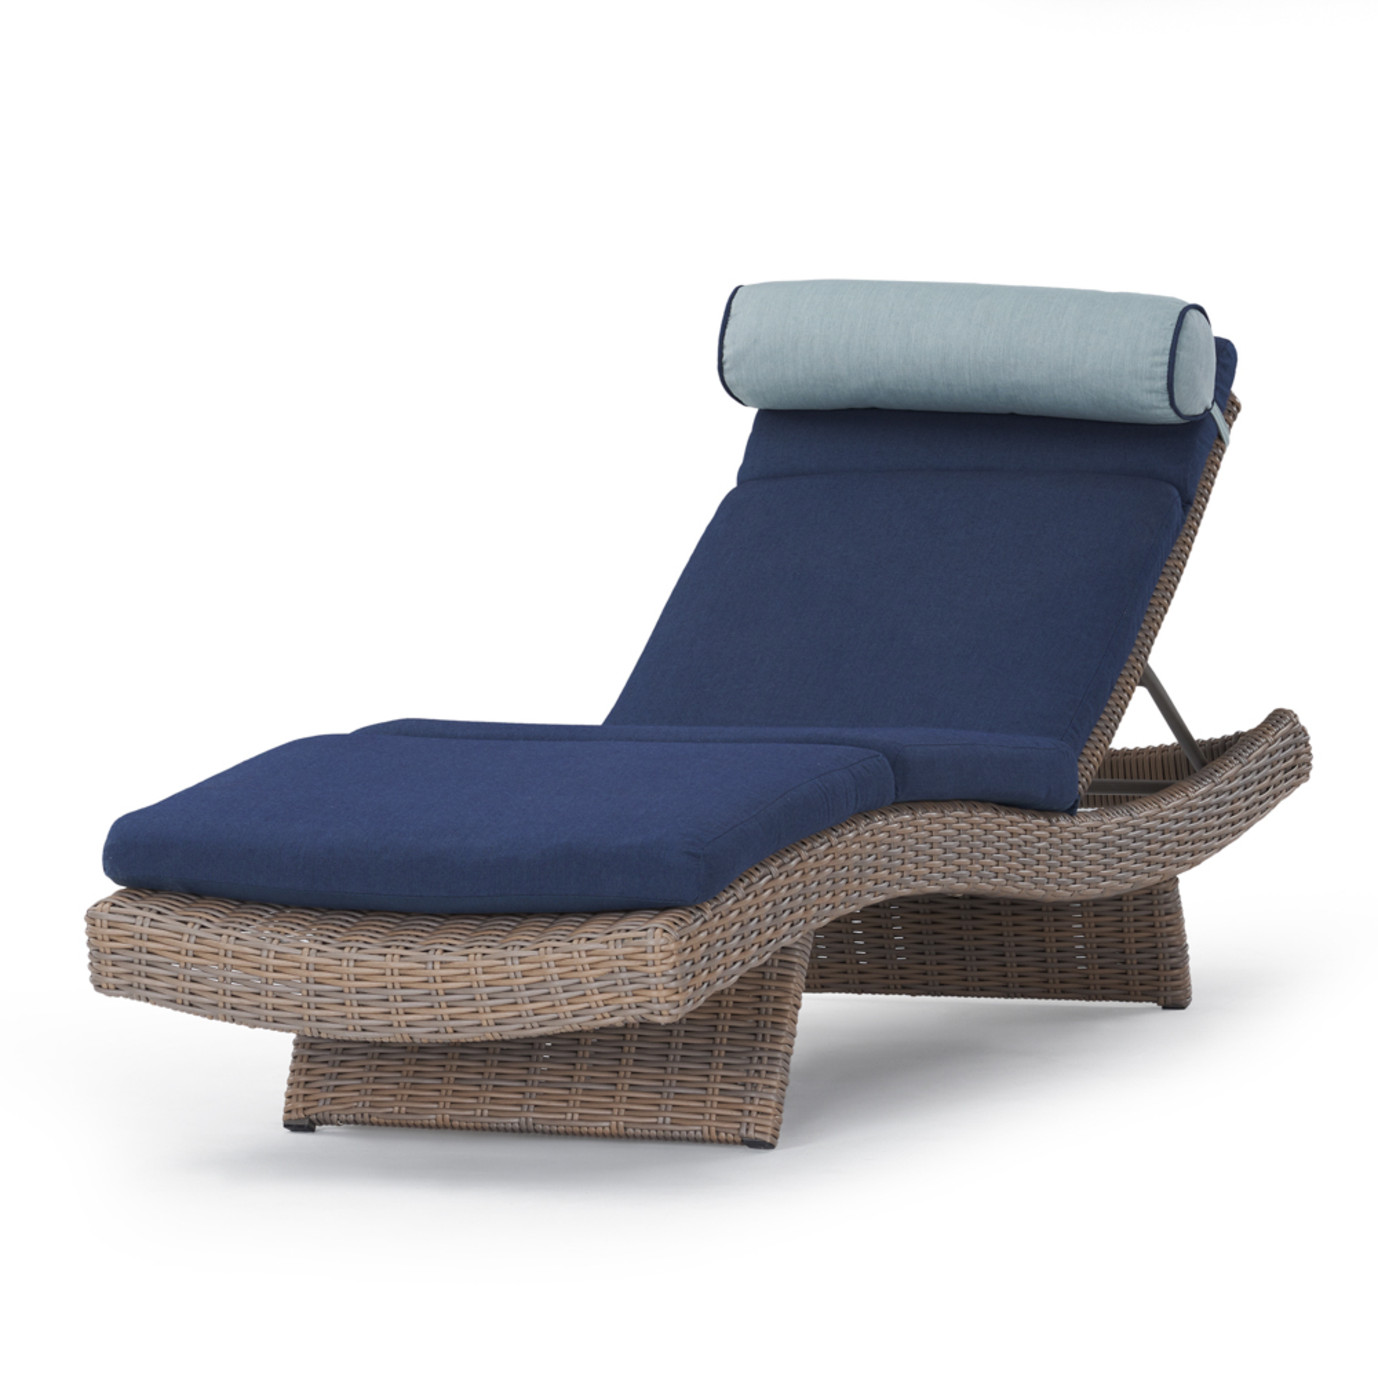 Portofino Repose 3pc Chaise Lounge Set - Laguna Blue